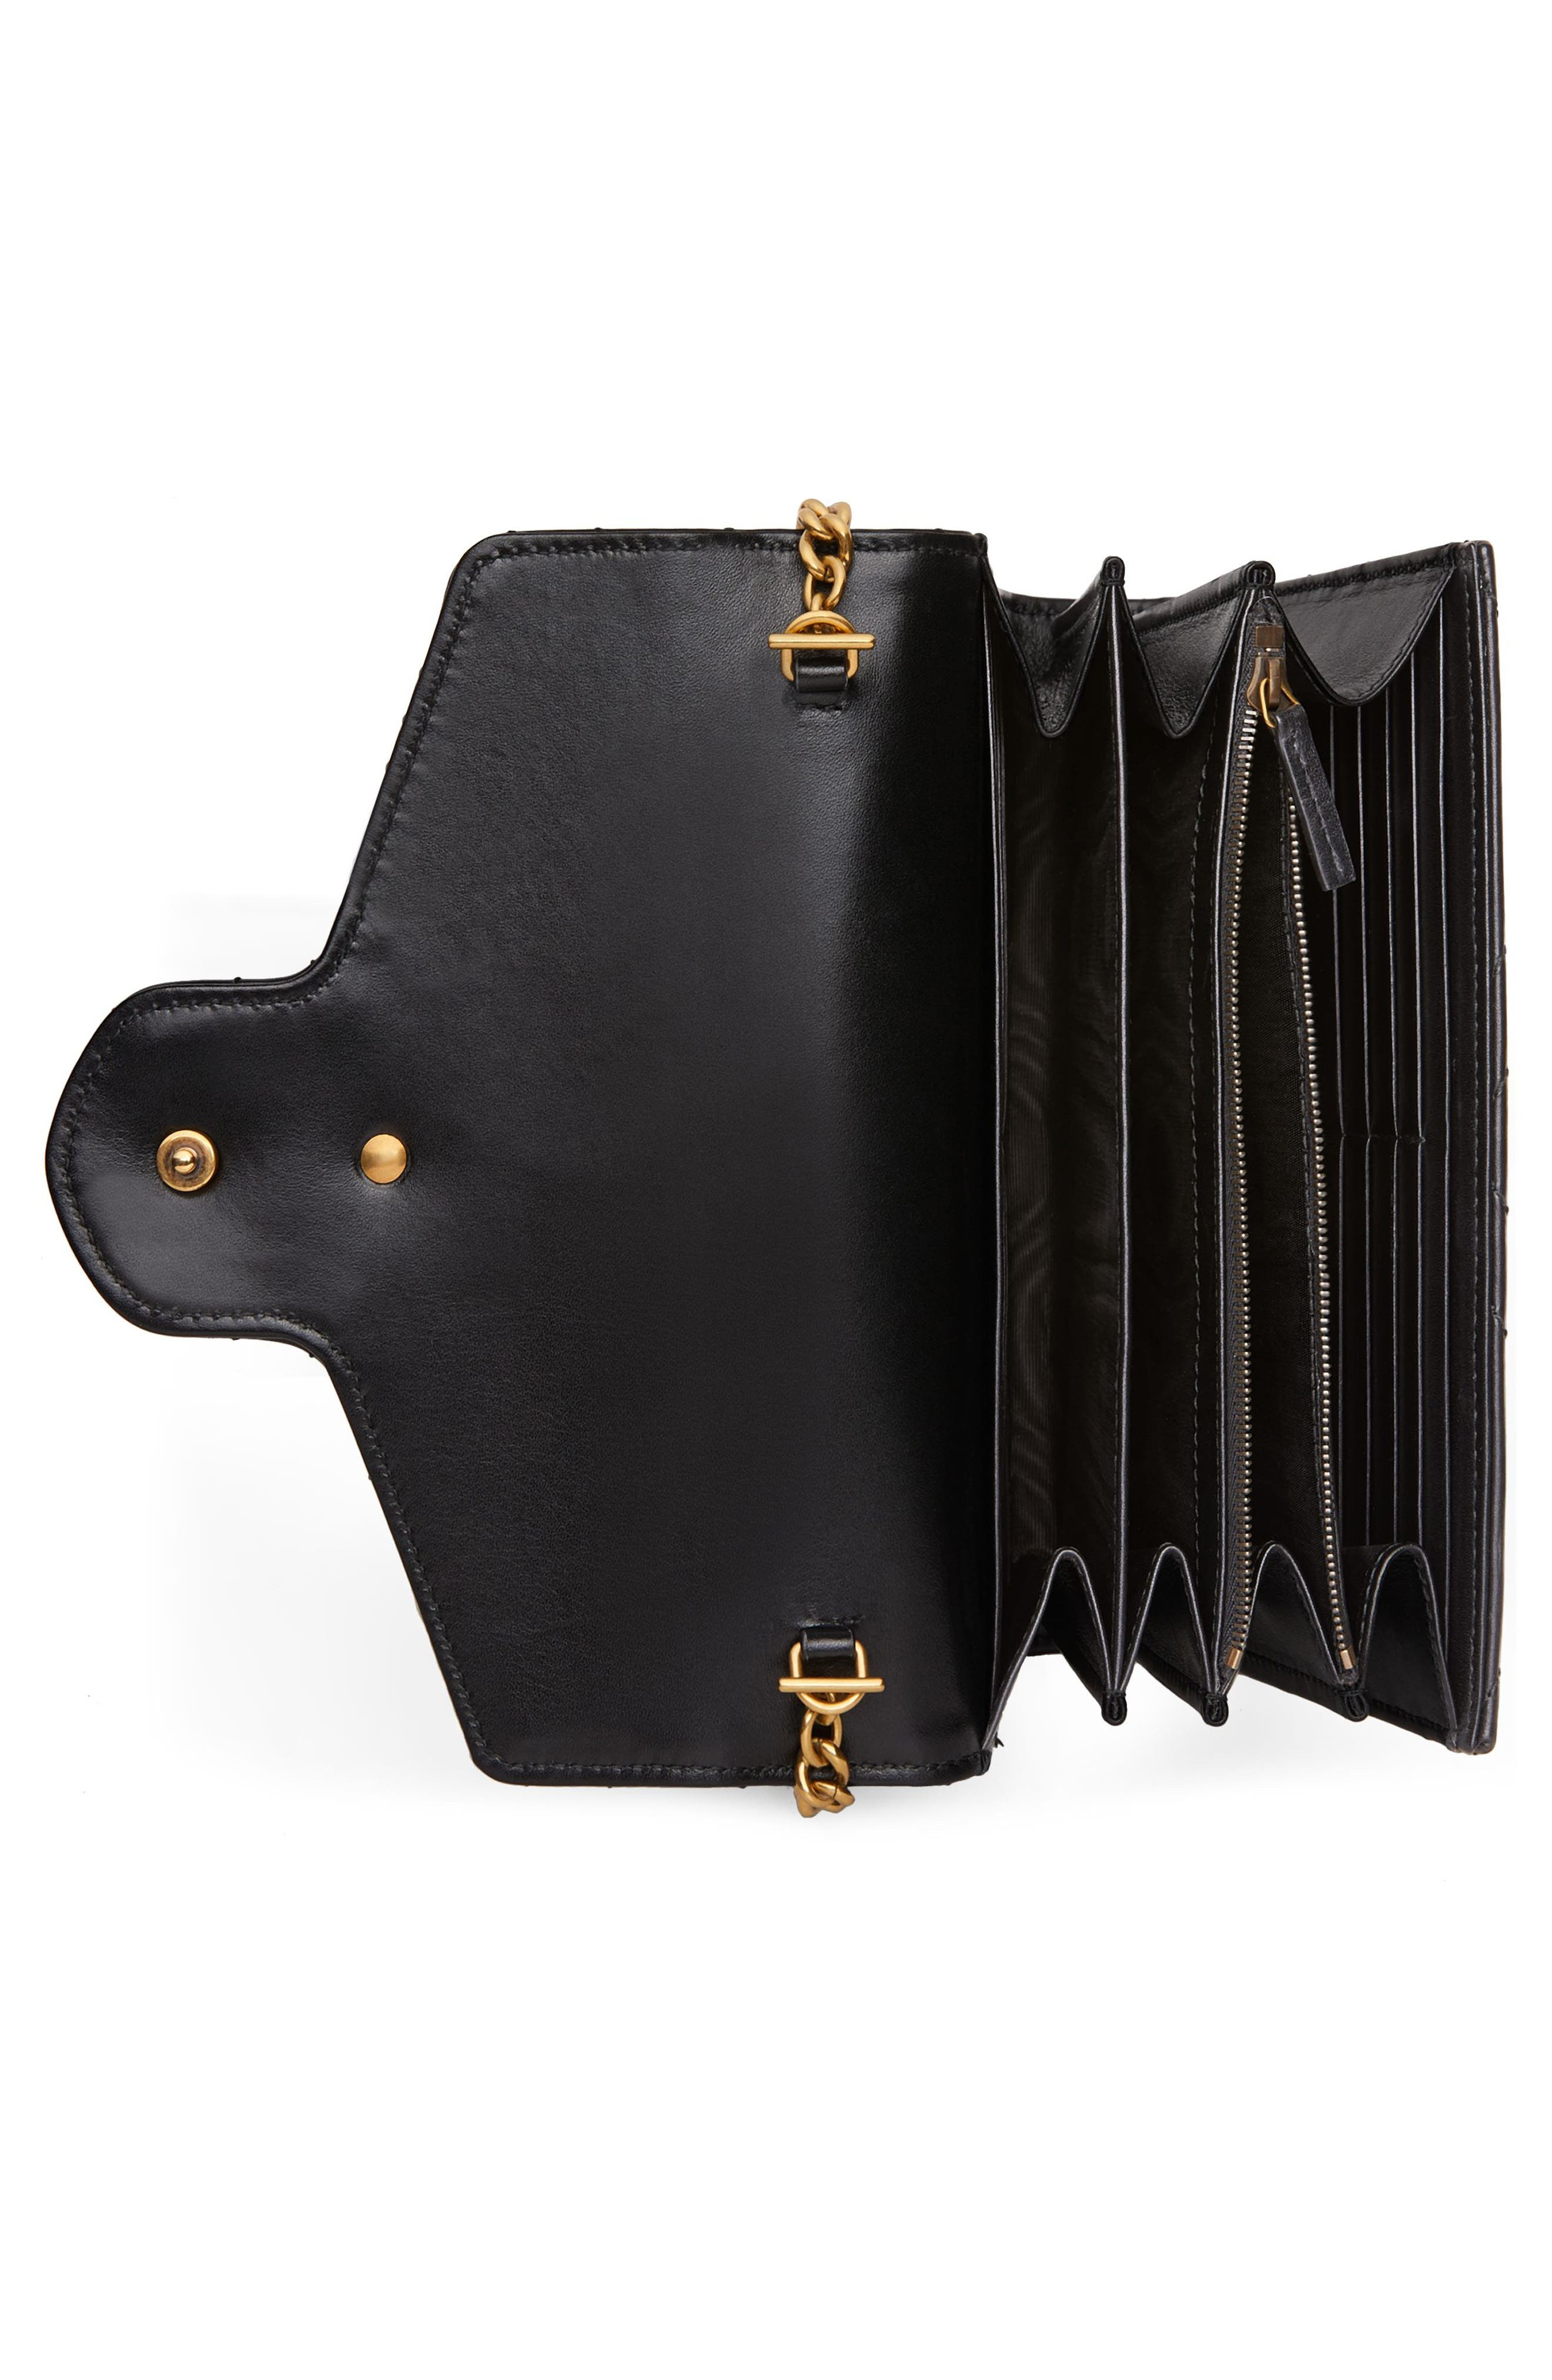 GUCCI, GG Marmont Matelassé Leather Wallet on a Chain, Alternate thumbnail 4, color, NERO